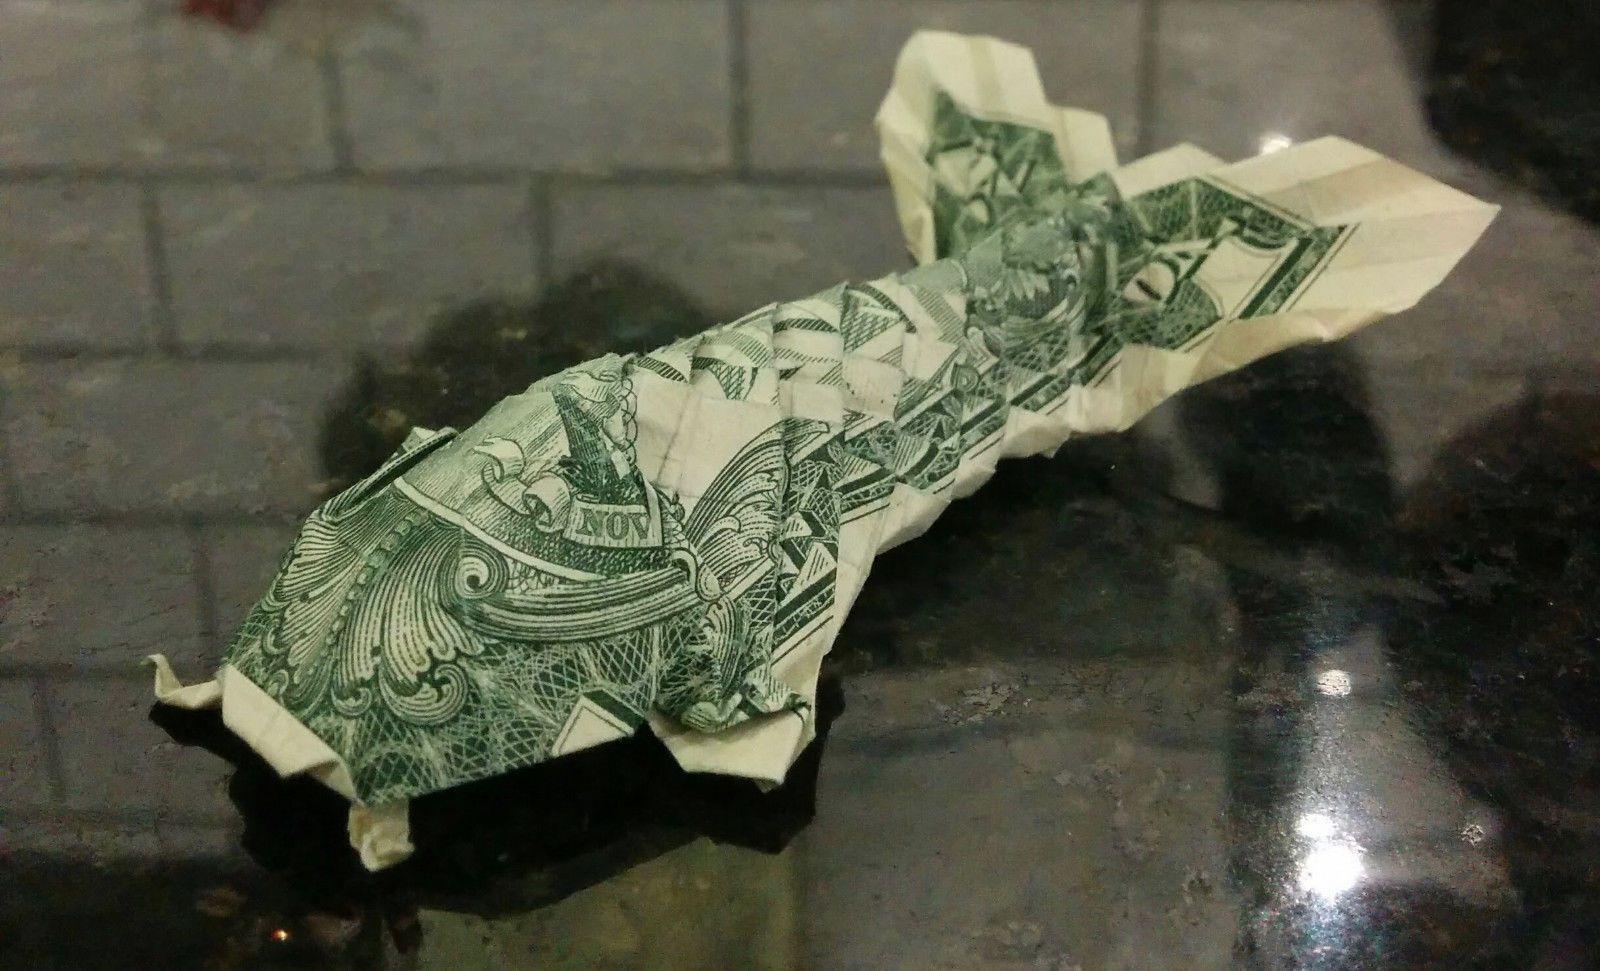 Money origami koi fish made with us 1 dollar bill common money origami koi fish made with us 1 dollar bill jeuxipadfo Choice Image